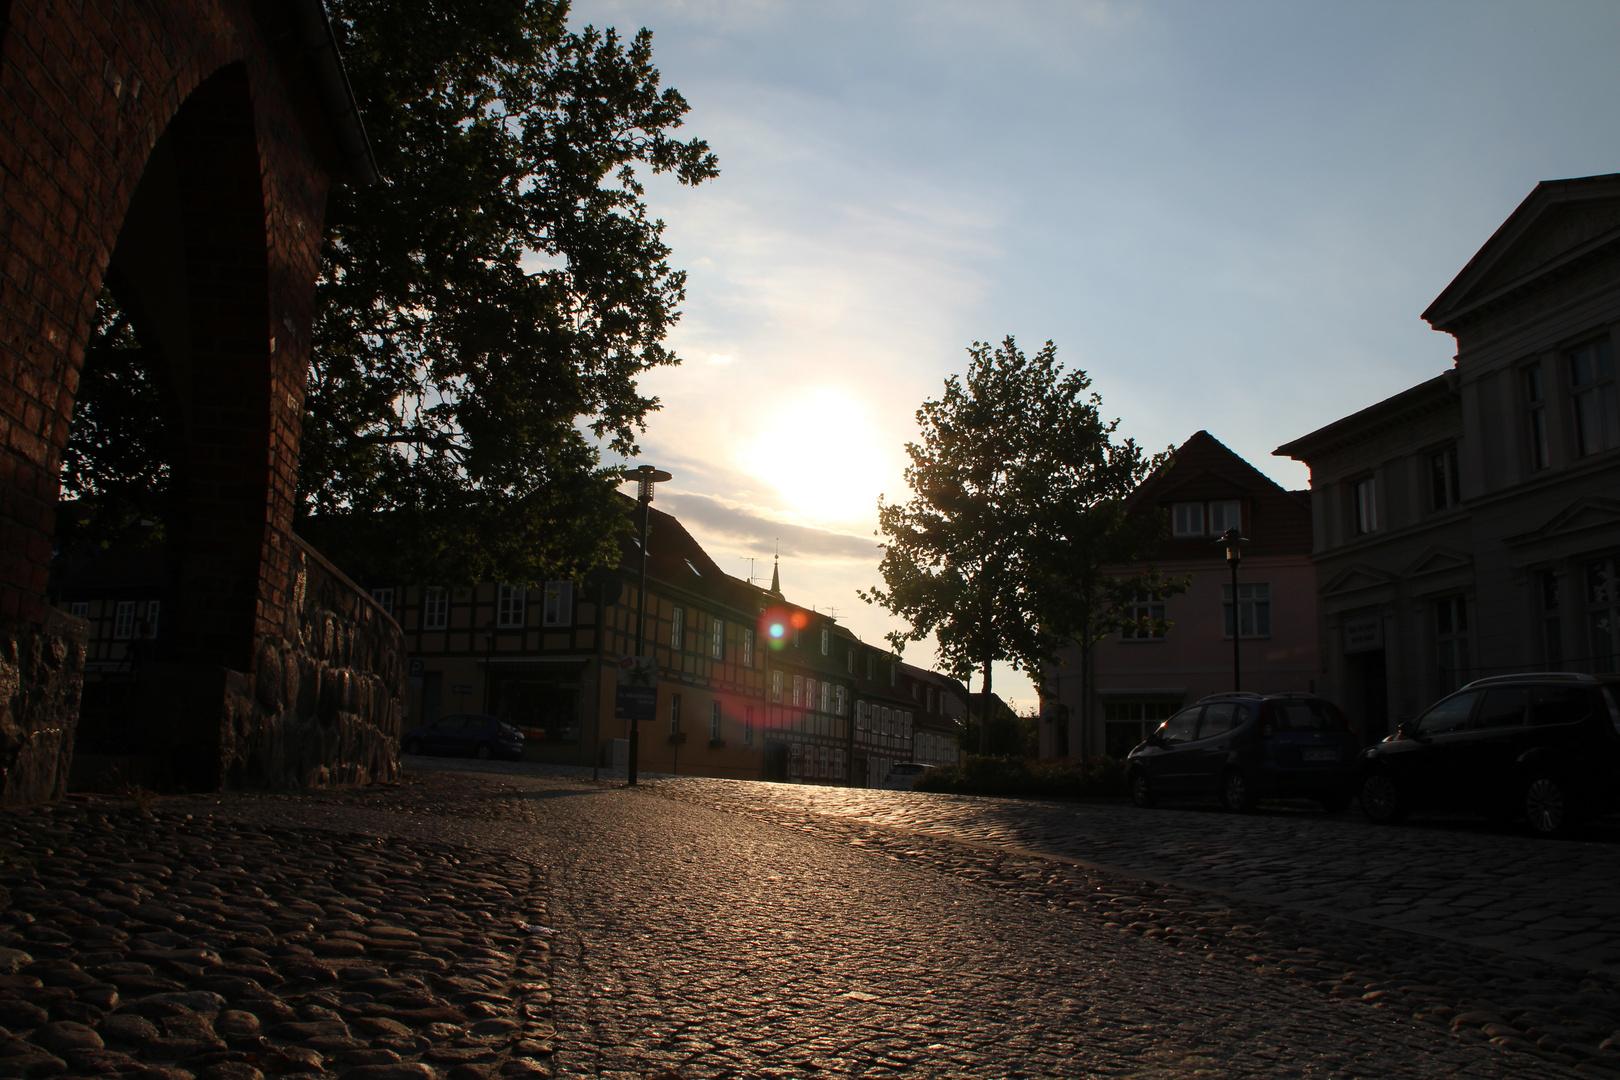 Sonnenuntergang in der Templiner Innenstadt